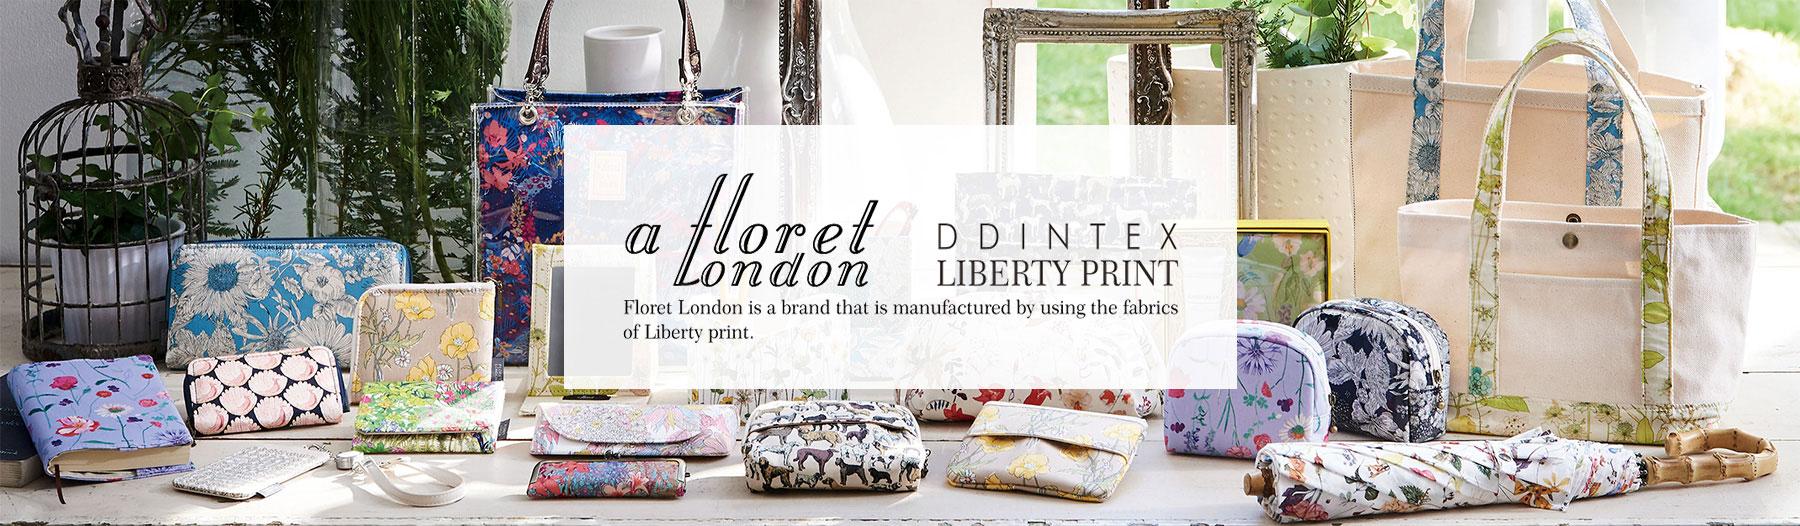 a floret london DDINTEX LIBERTY PRINT